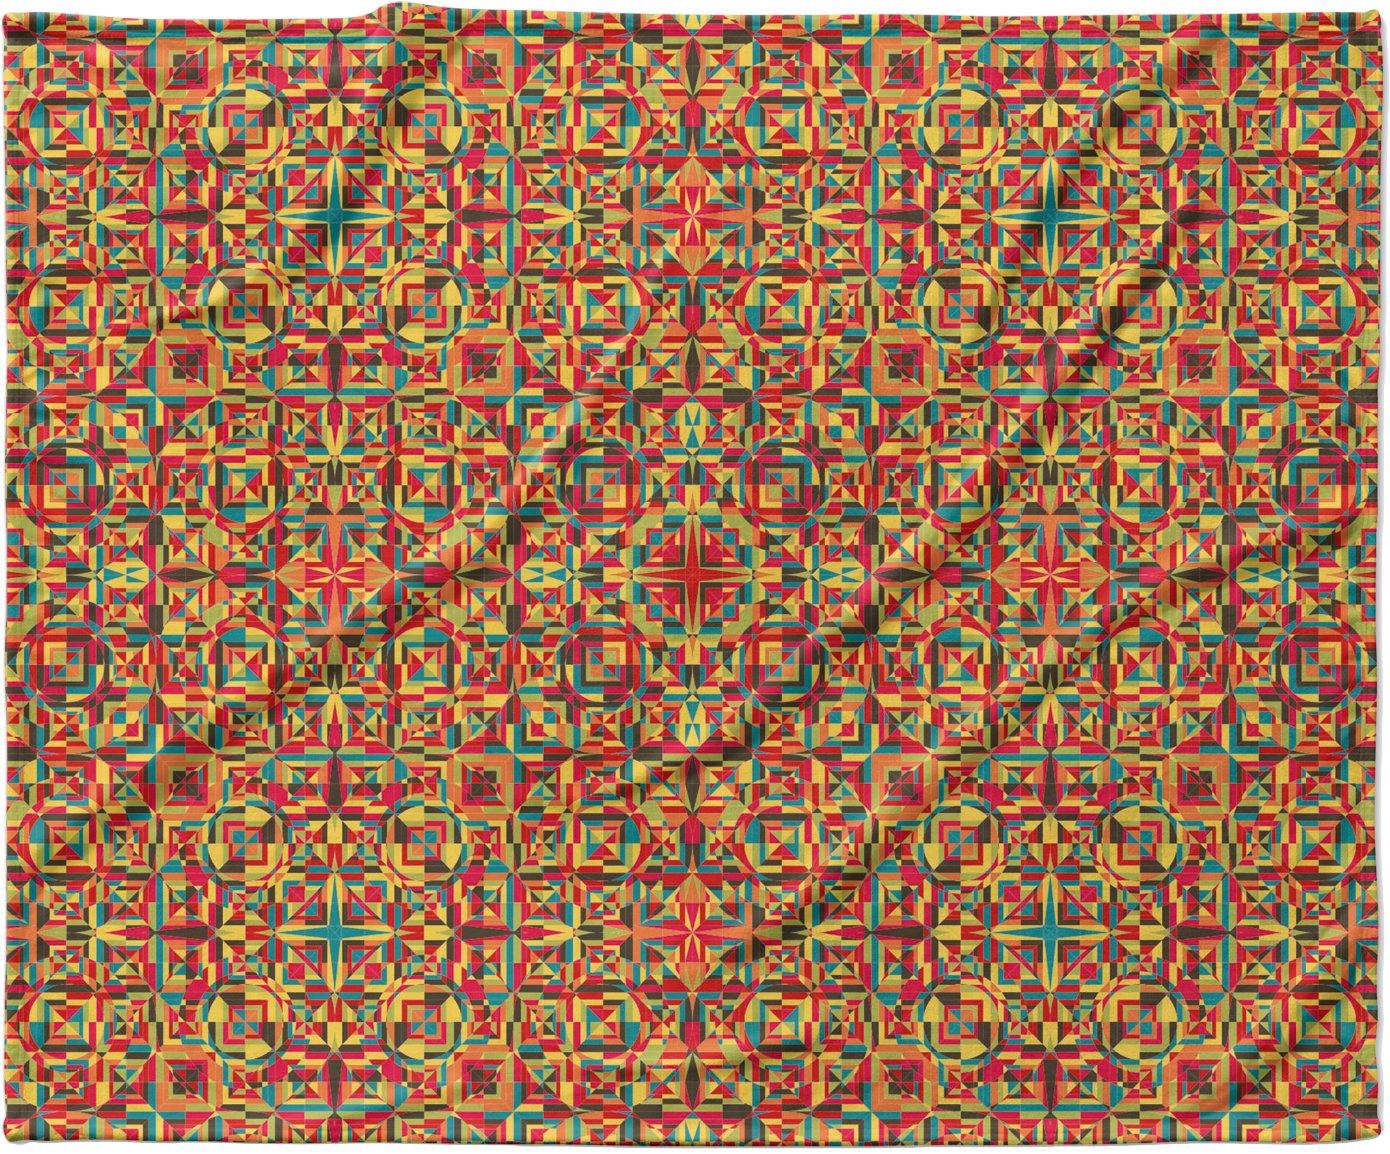 KESS InHouse Allison Soupcoff 'Circus' Orange Fleece Baby Blanket, 40' x 30'